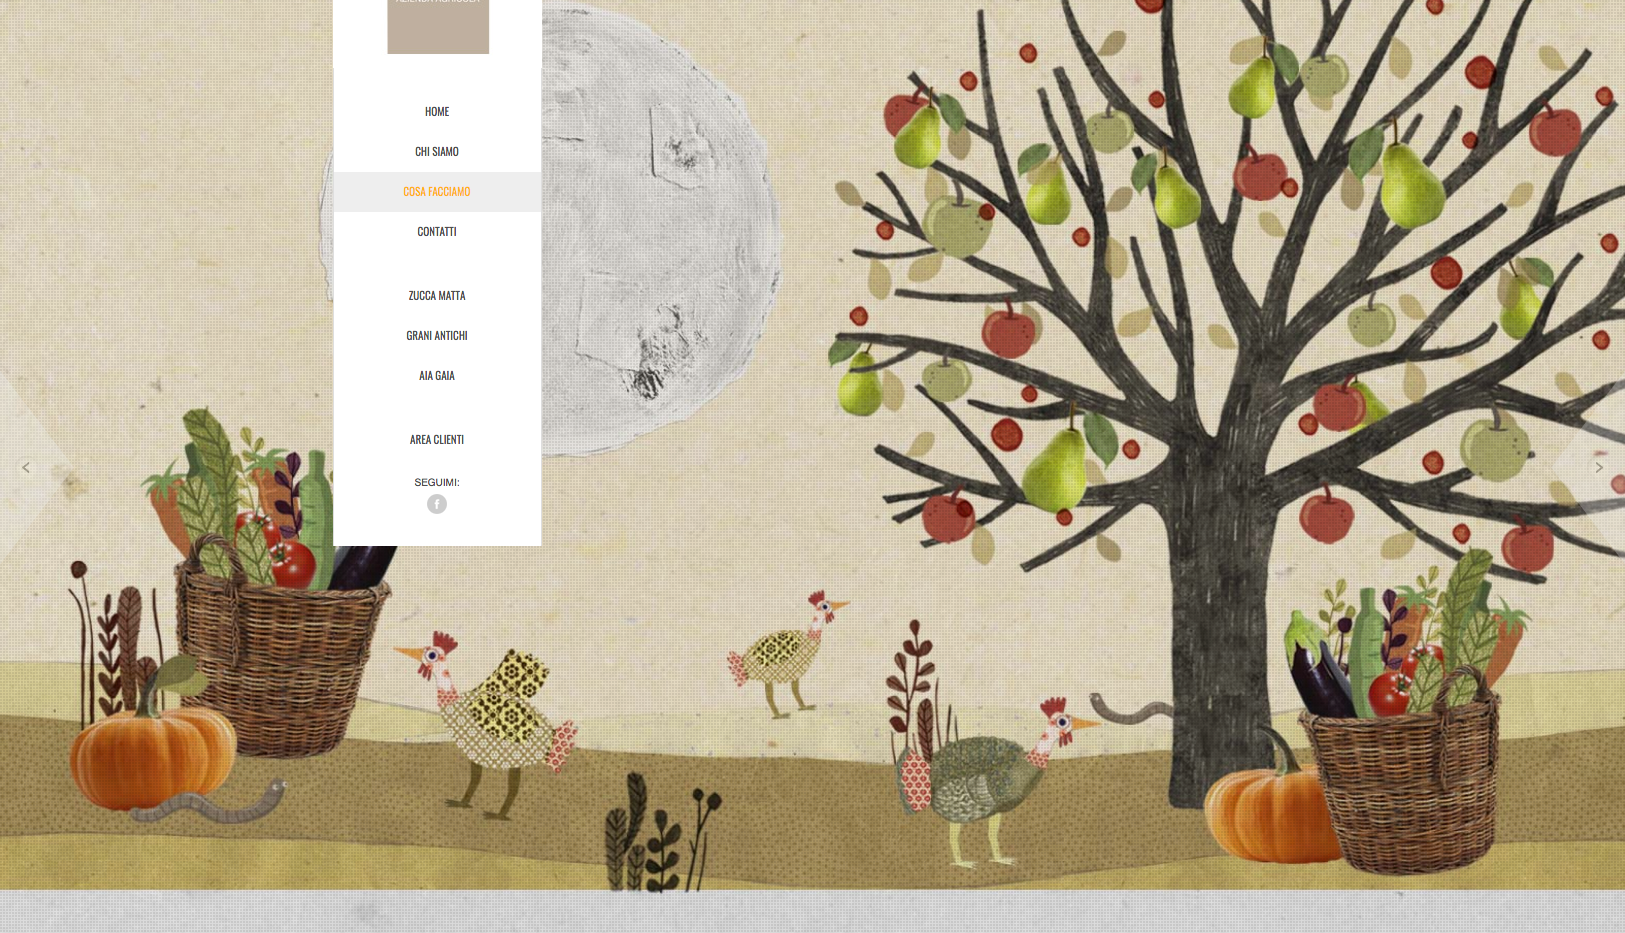 terre vive web site artwork